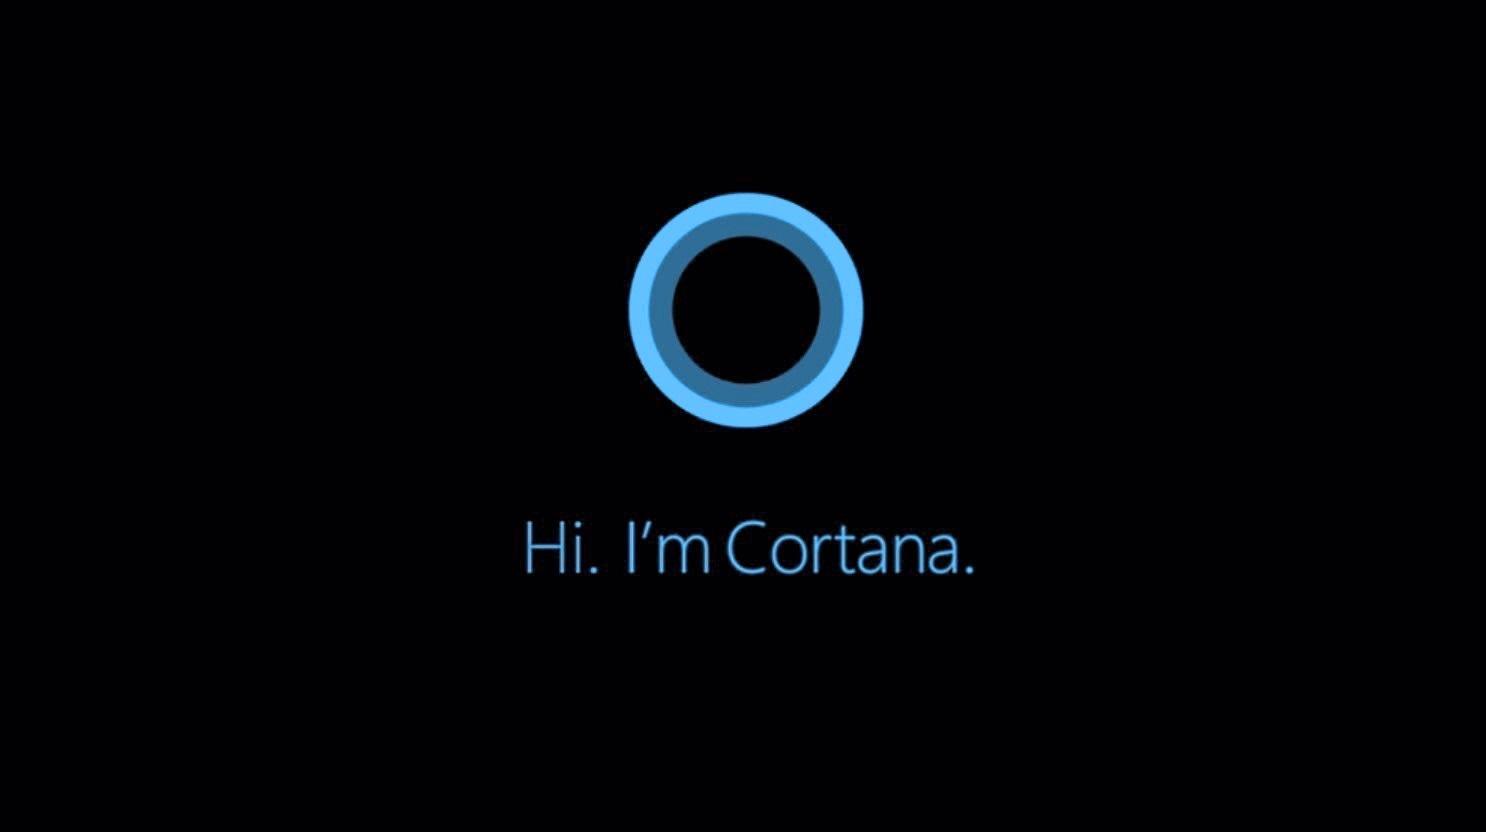 Cortana diz oi